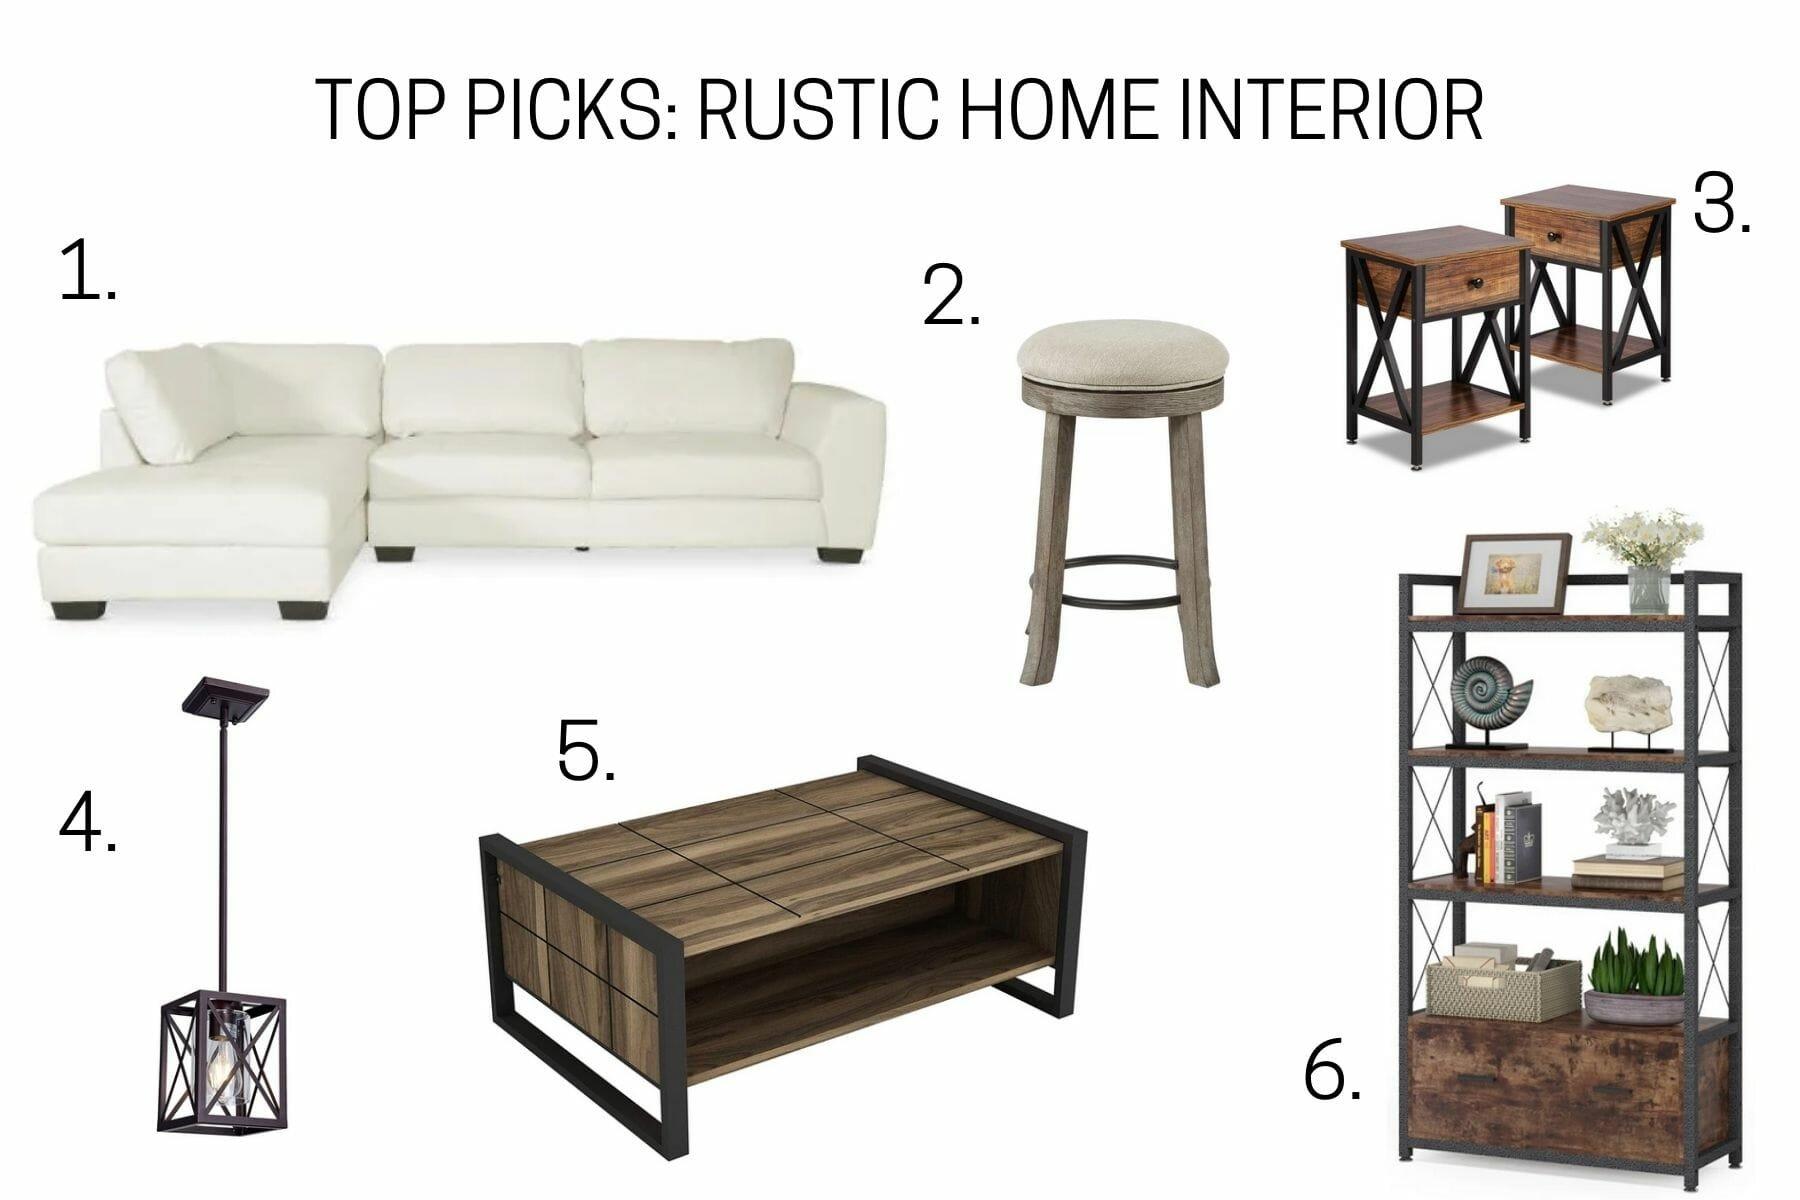 Top picks for rustic home interior design